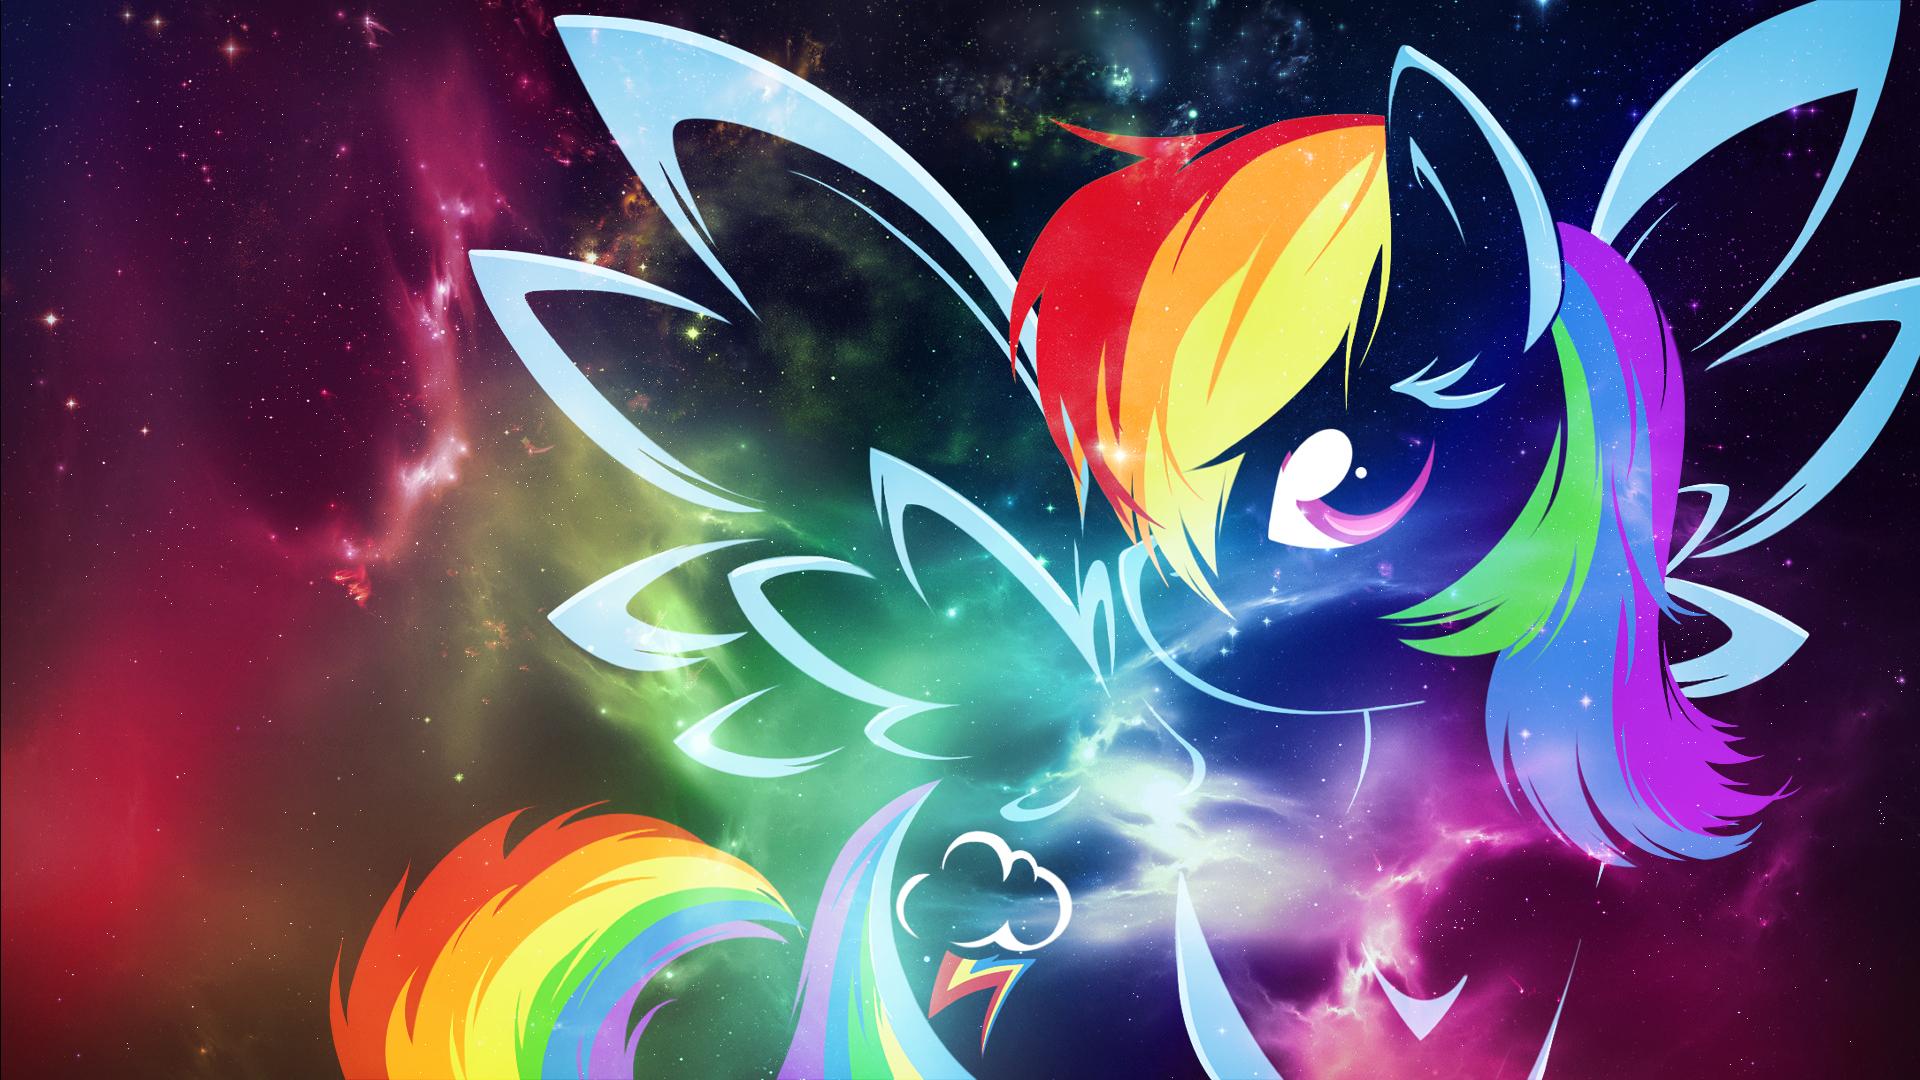 Rainbow Dash Background - WallpaperSafari